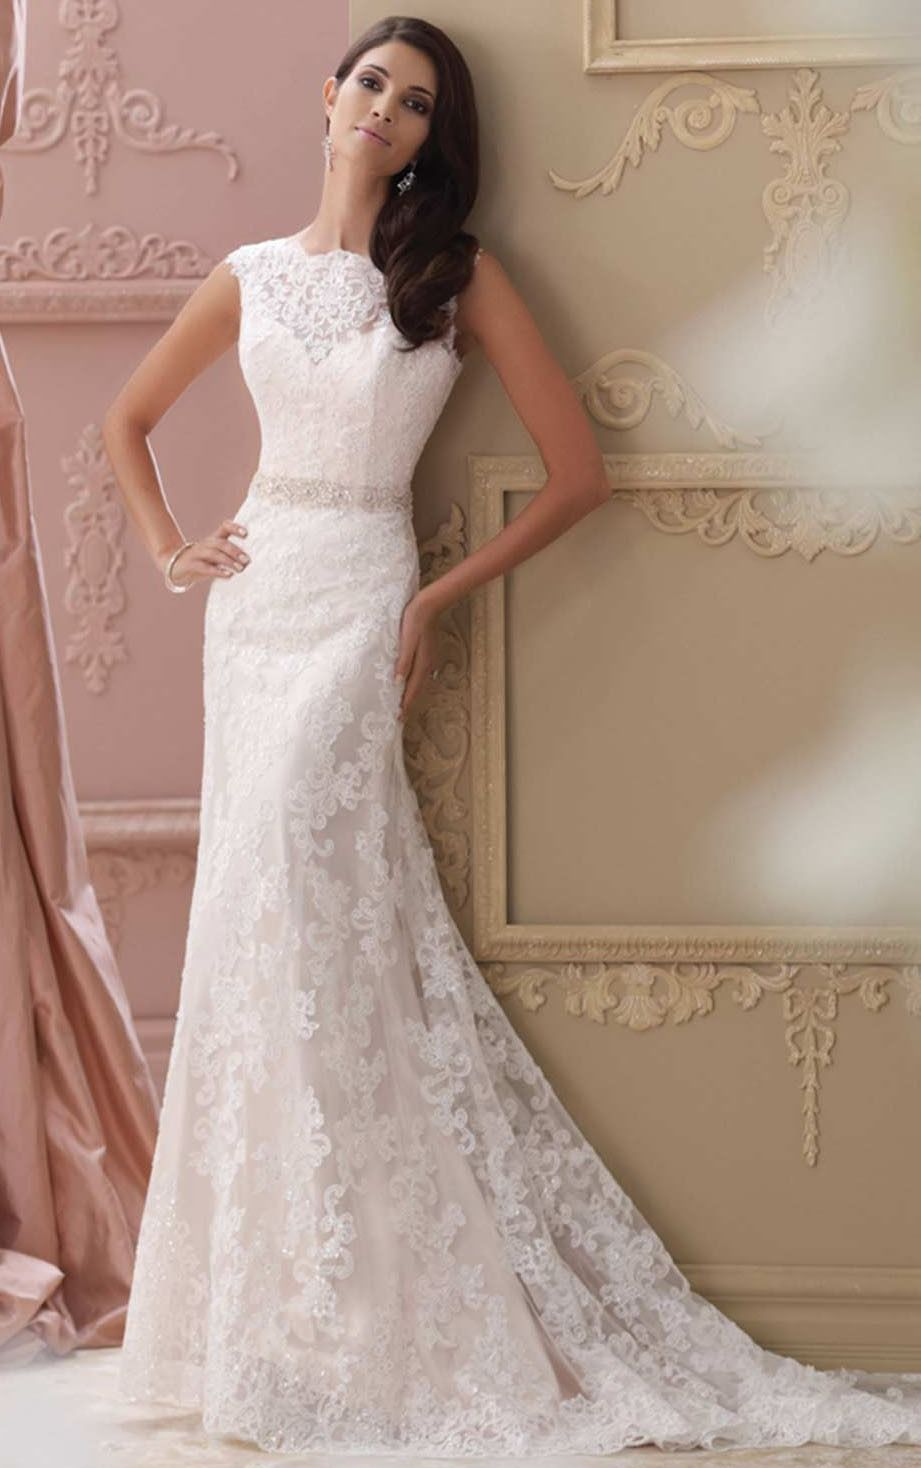 bridal gownswedding dressessheath lace jewel natural floor